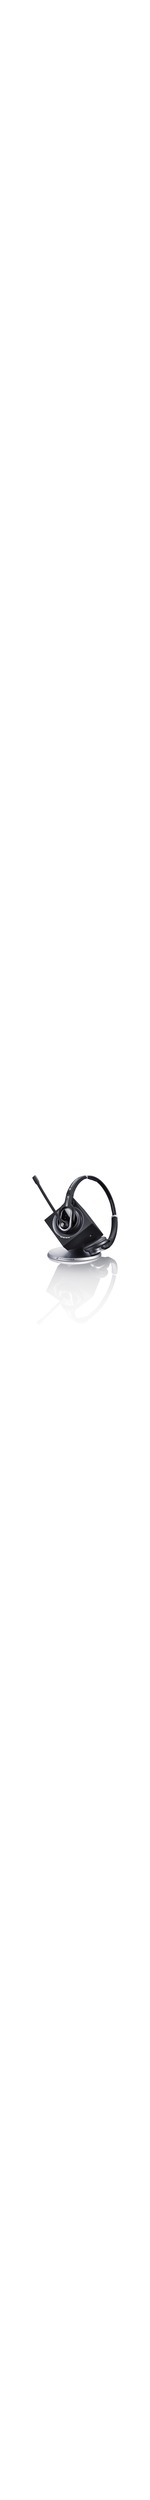 Sennheiser DW Pro2 USB ML EU Wireless DECT 50 mm Stereo Headset - Over-the-head - Circumaural - Black - 180 m